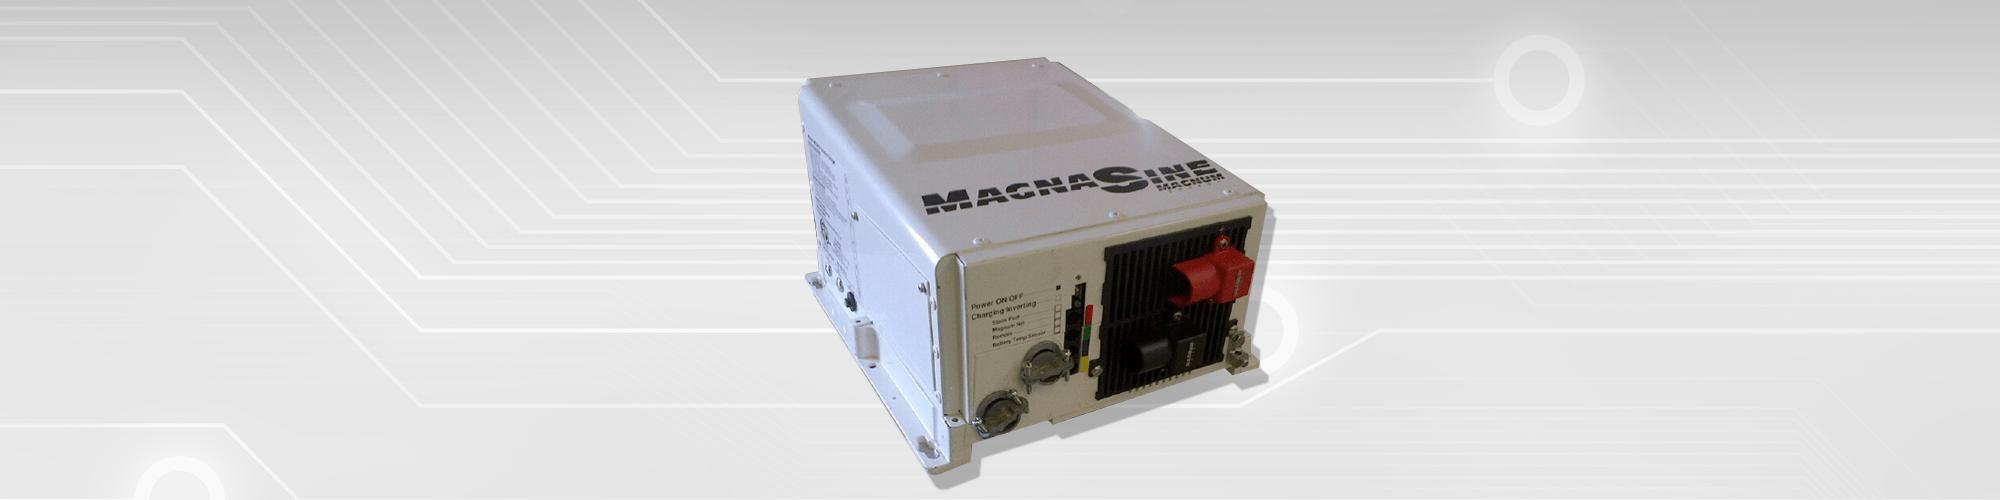 hight resolution of  our testimonials marine power solutions tekrispower com on xantrex freedom 20 inverter onan inverter charger wiring diagram